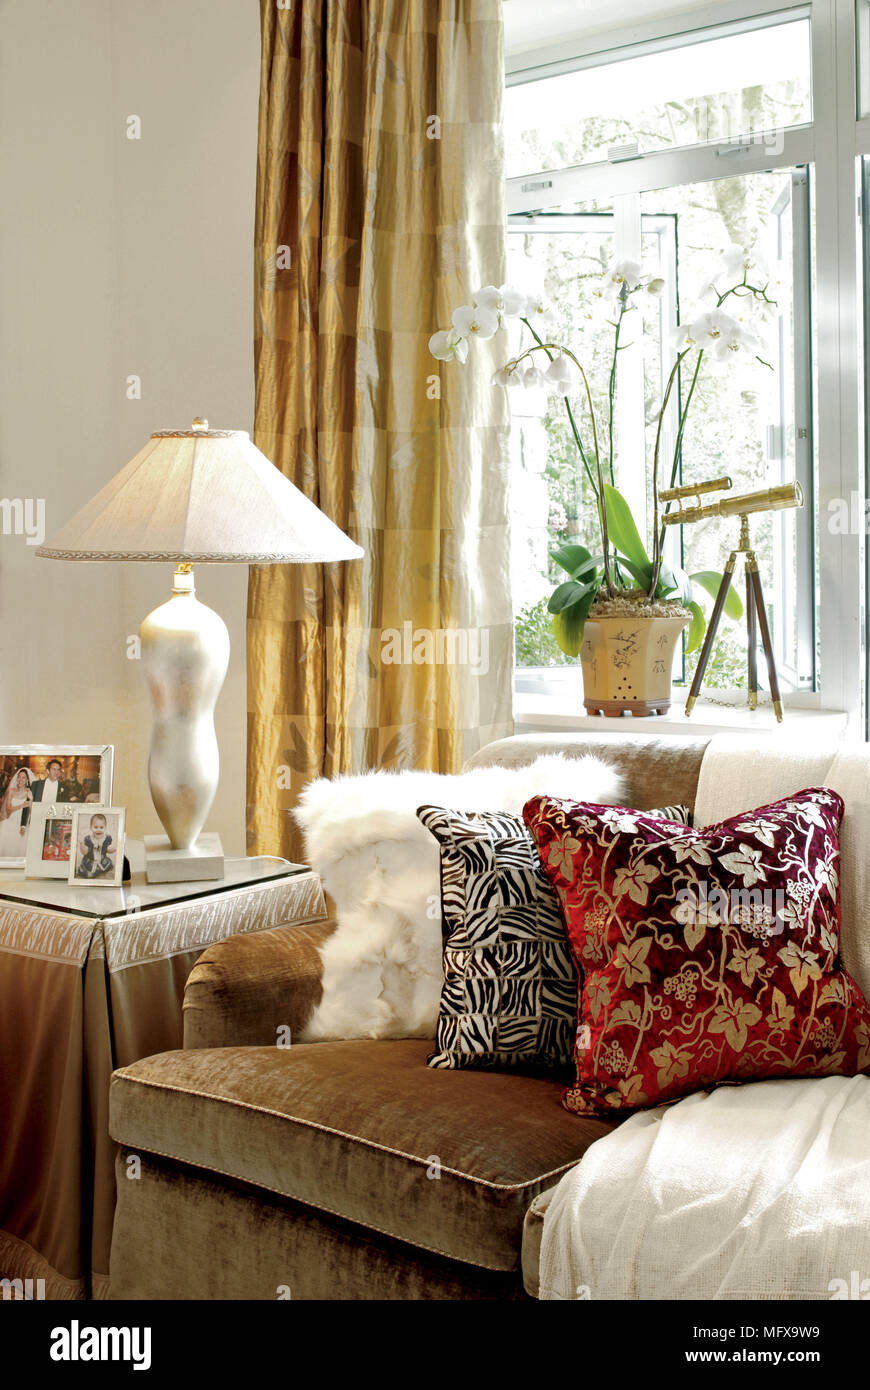 Cuscini Divano Marrone.Patterned Cushions On Red Sofa Immagini Patterned Cushions On